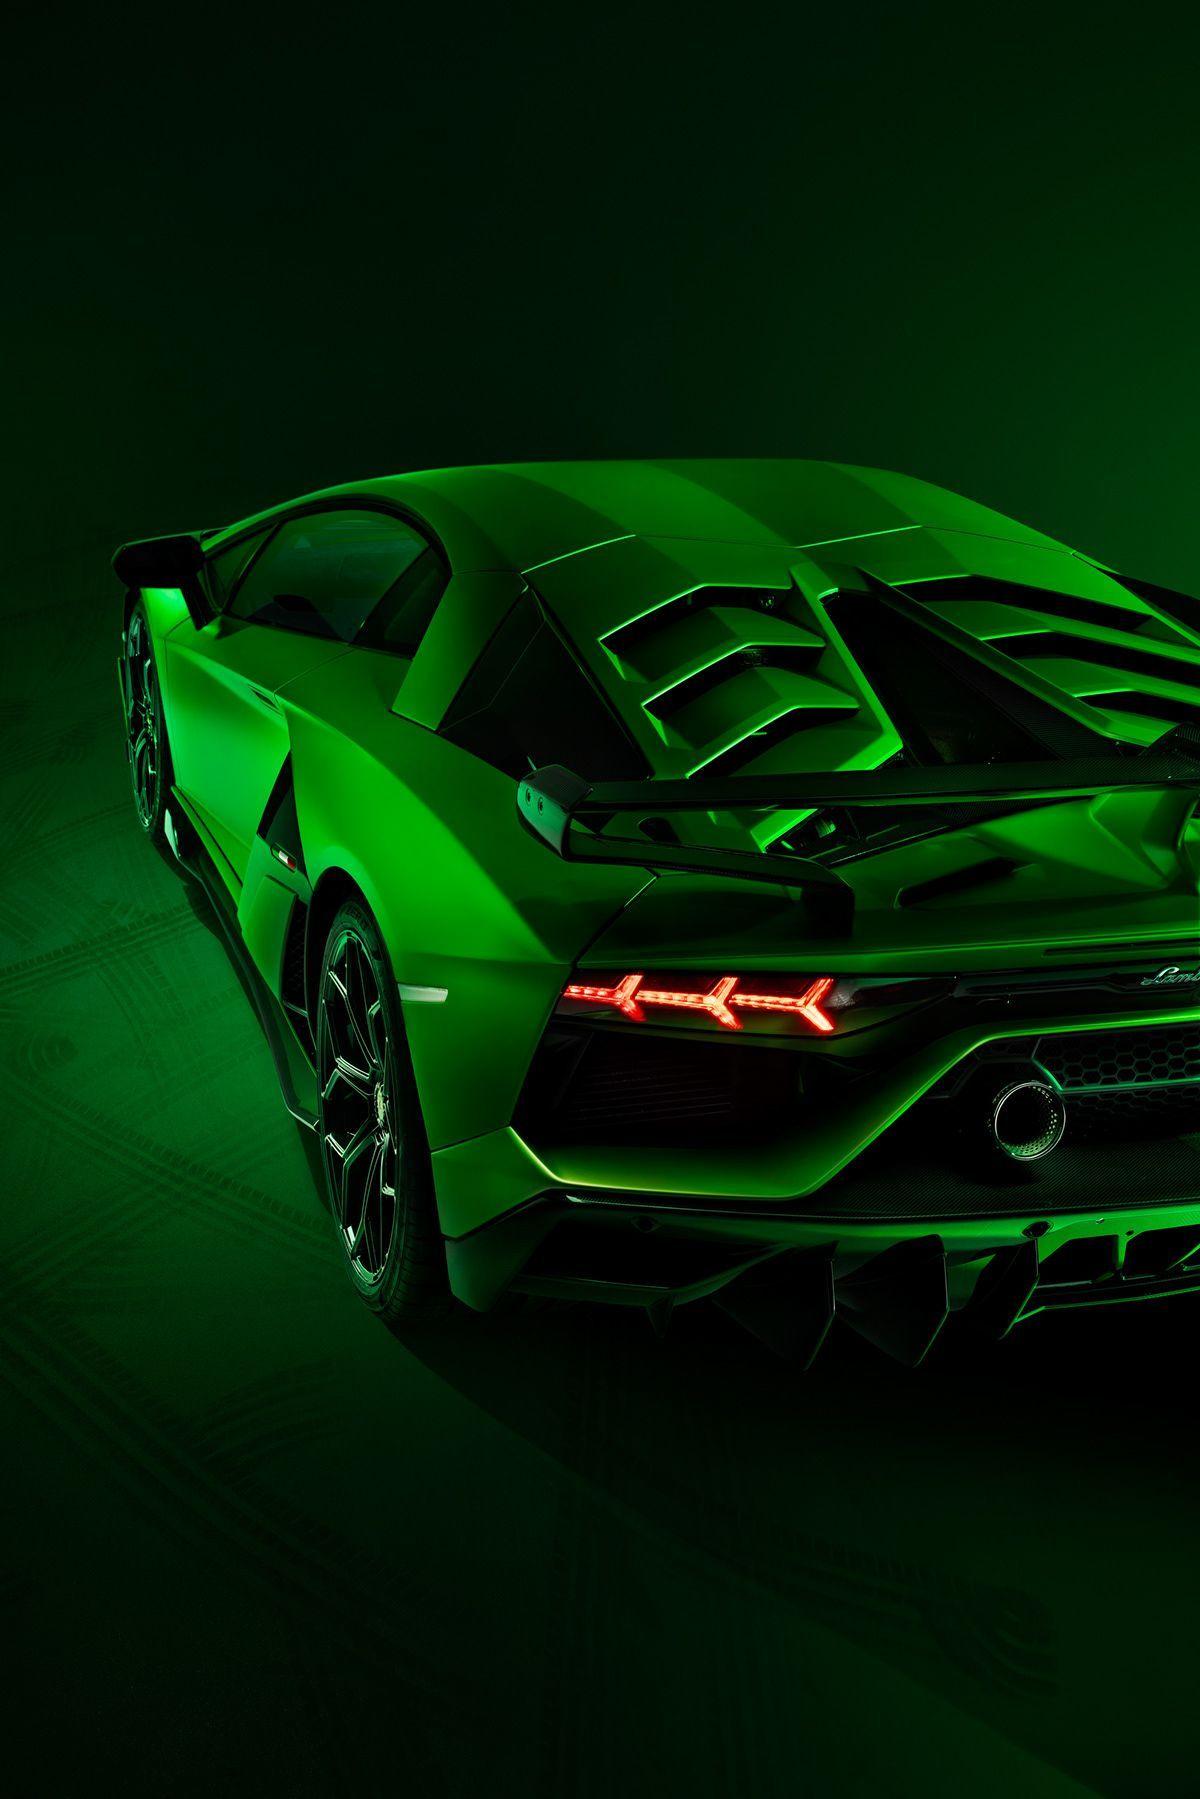 Neon Green Car Wallpaper 4k